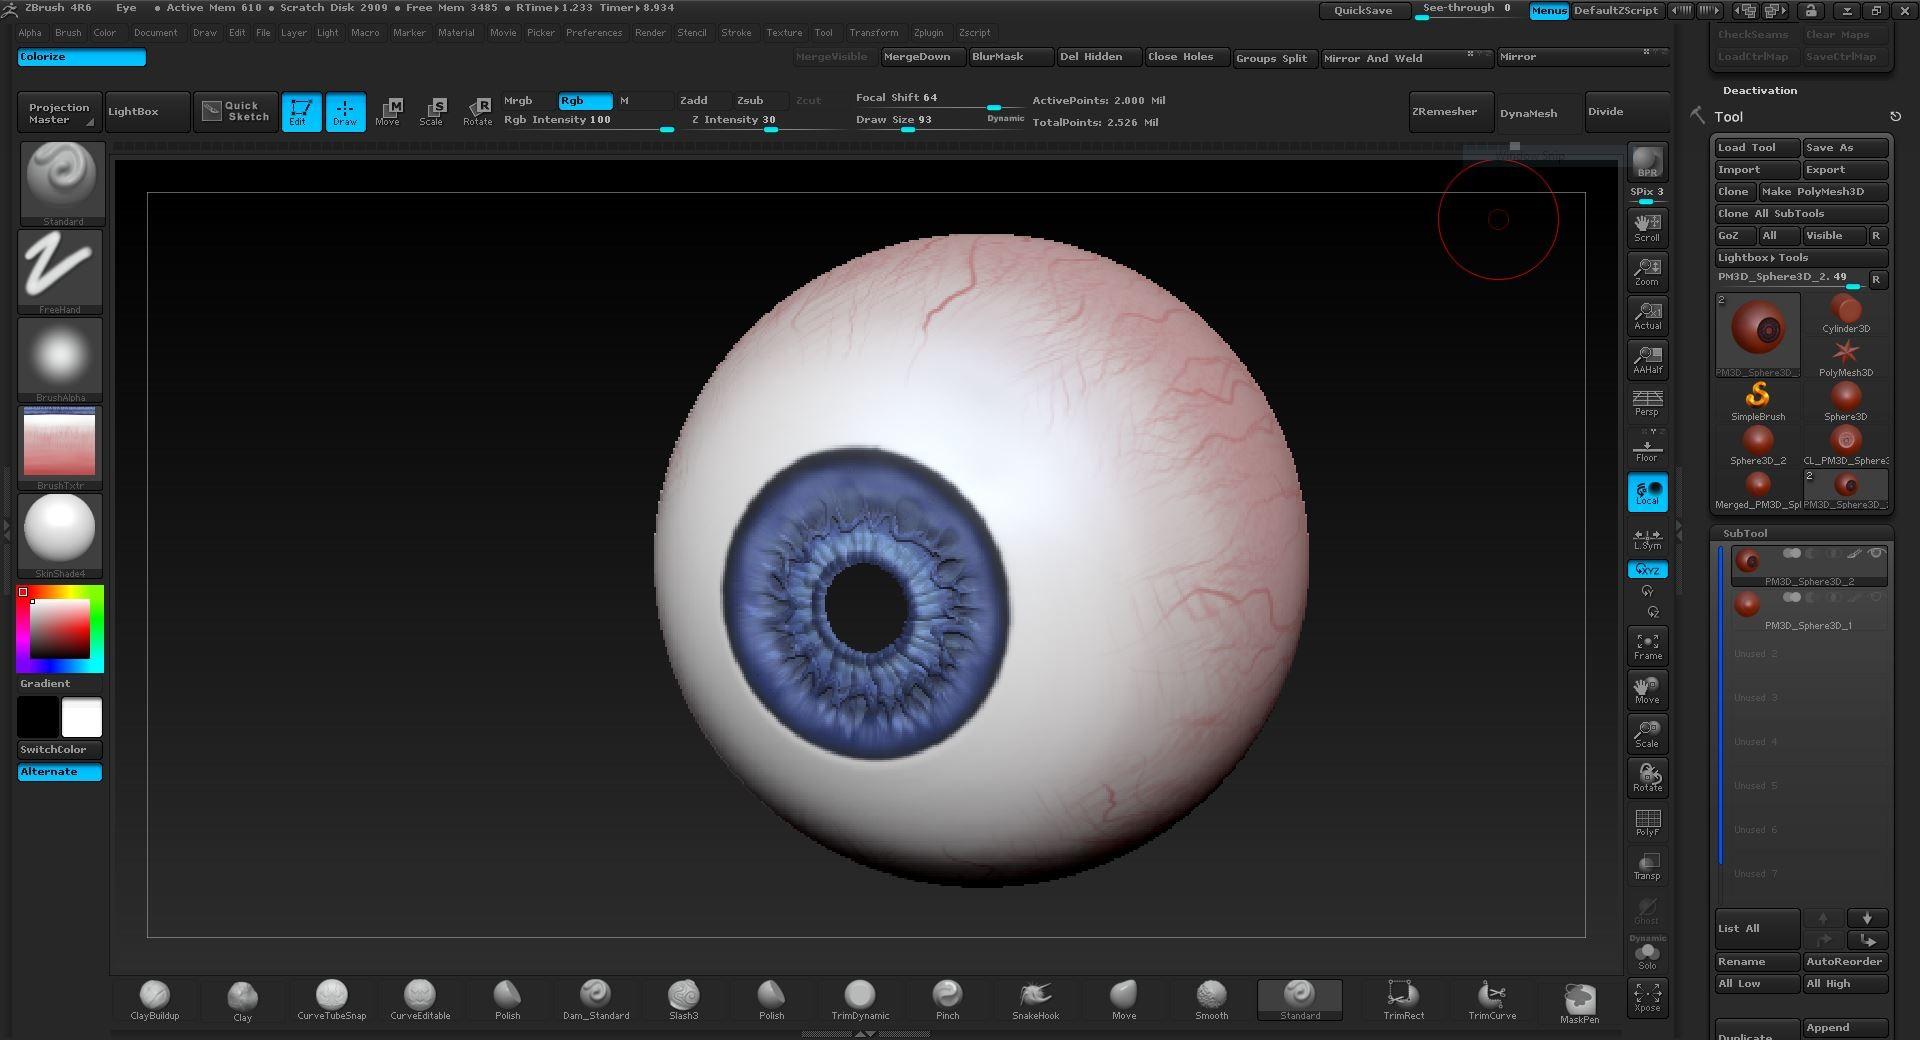 Alonzo emata eye